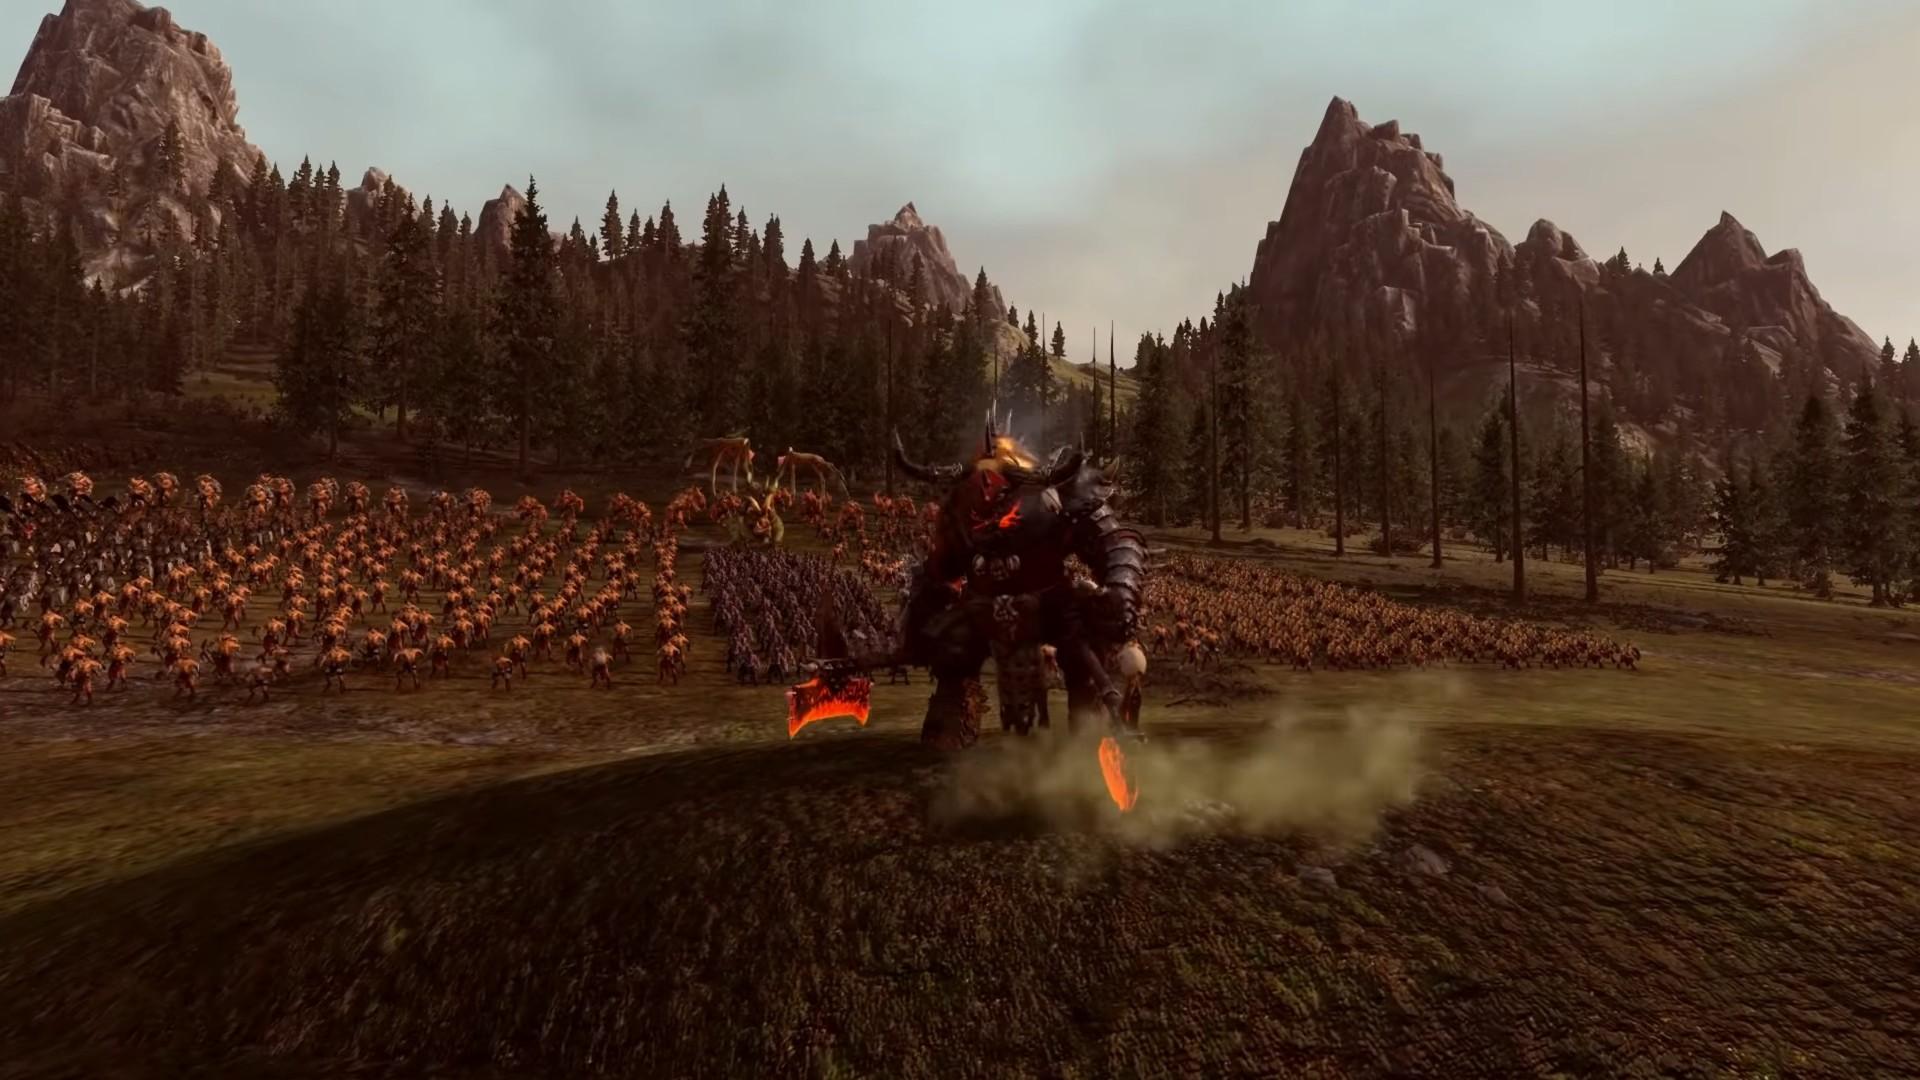 the-beastmen-rework-for-total-war:-warhammer-ii-has-been-unveiled